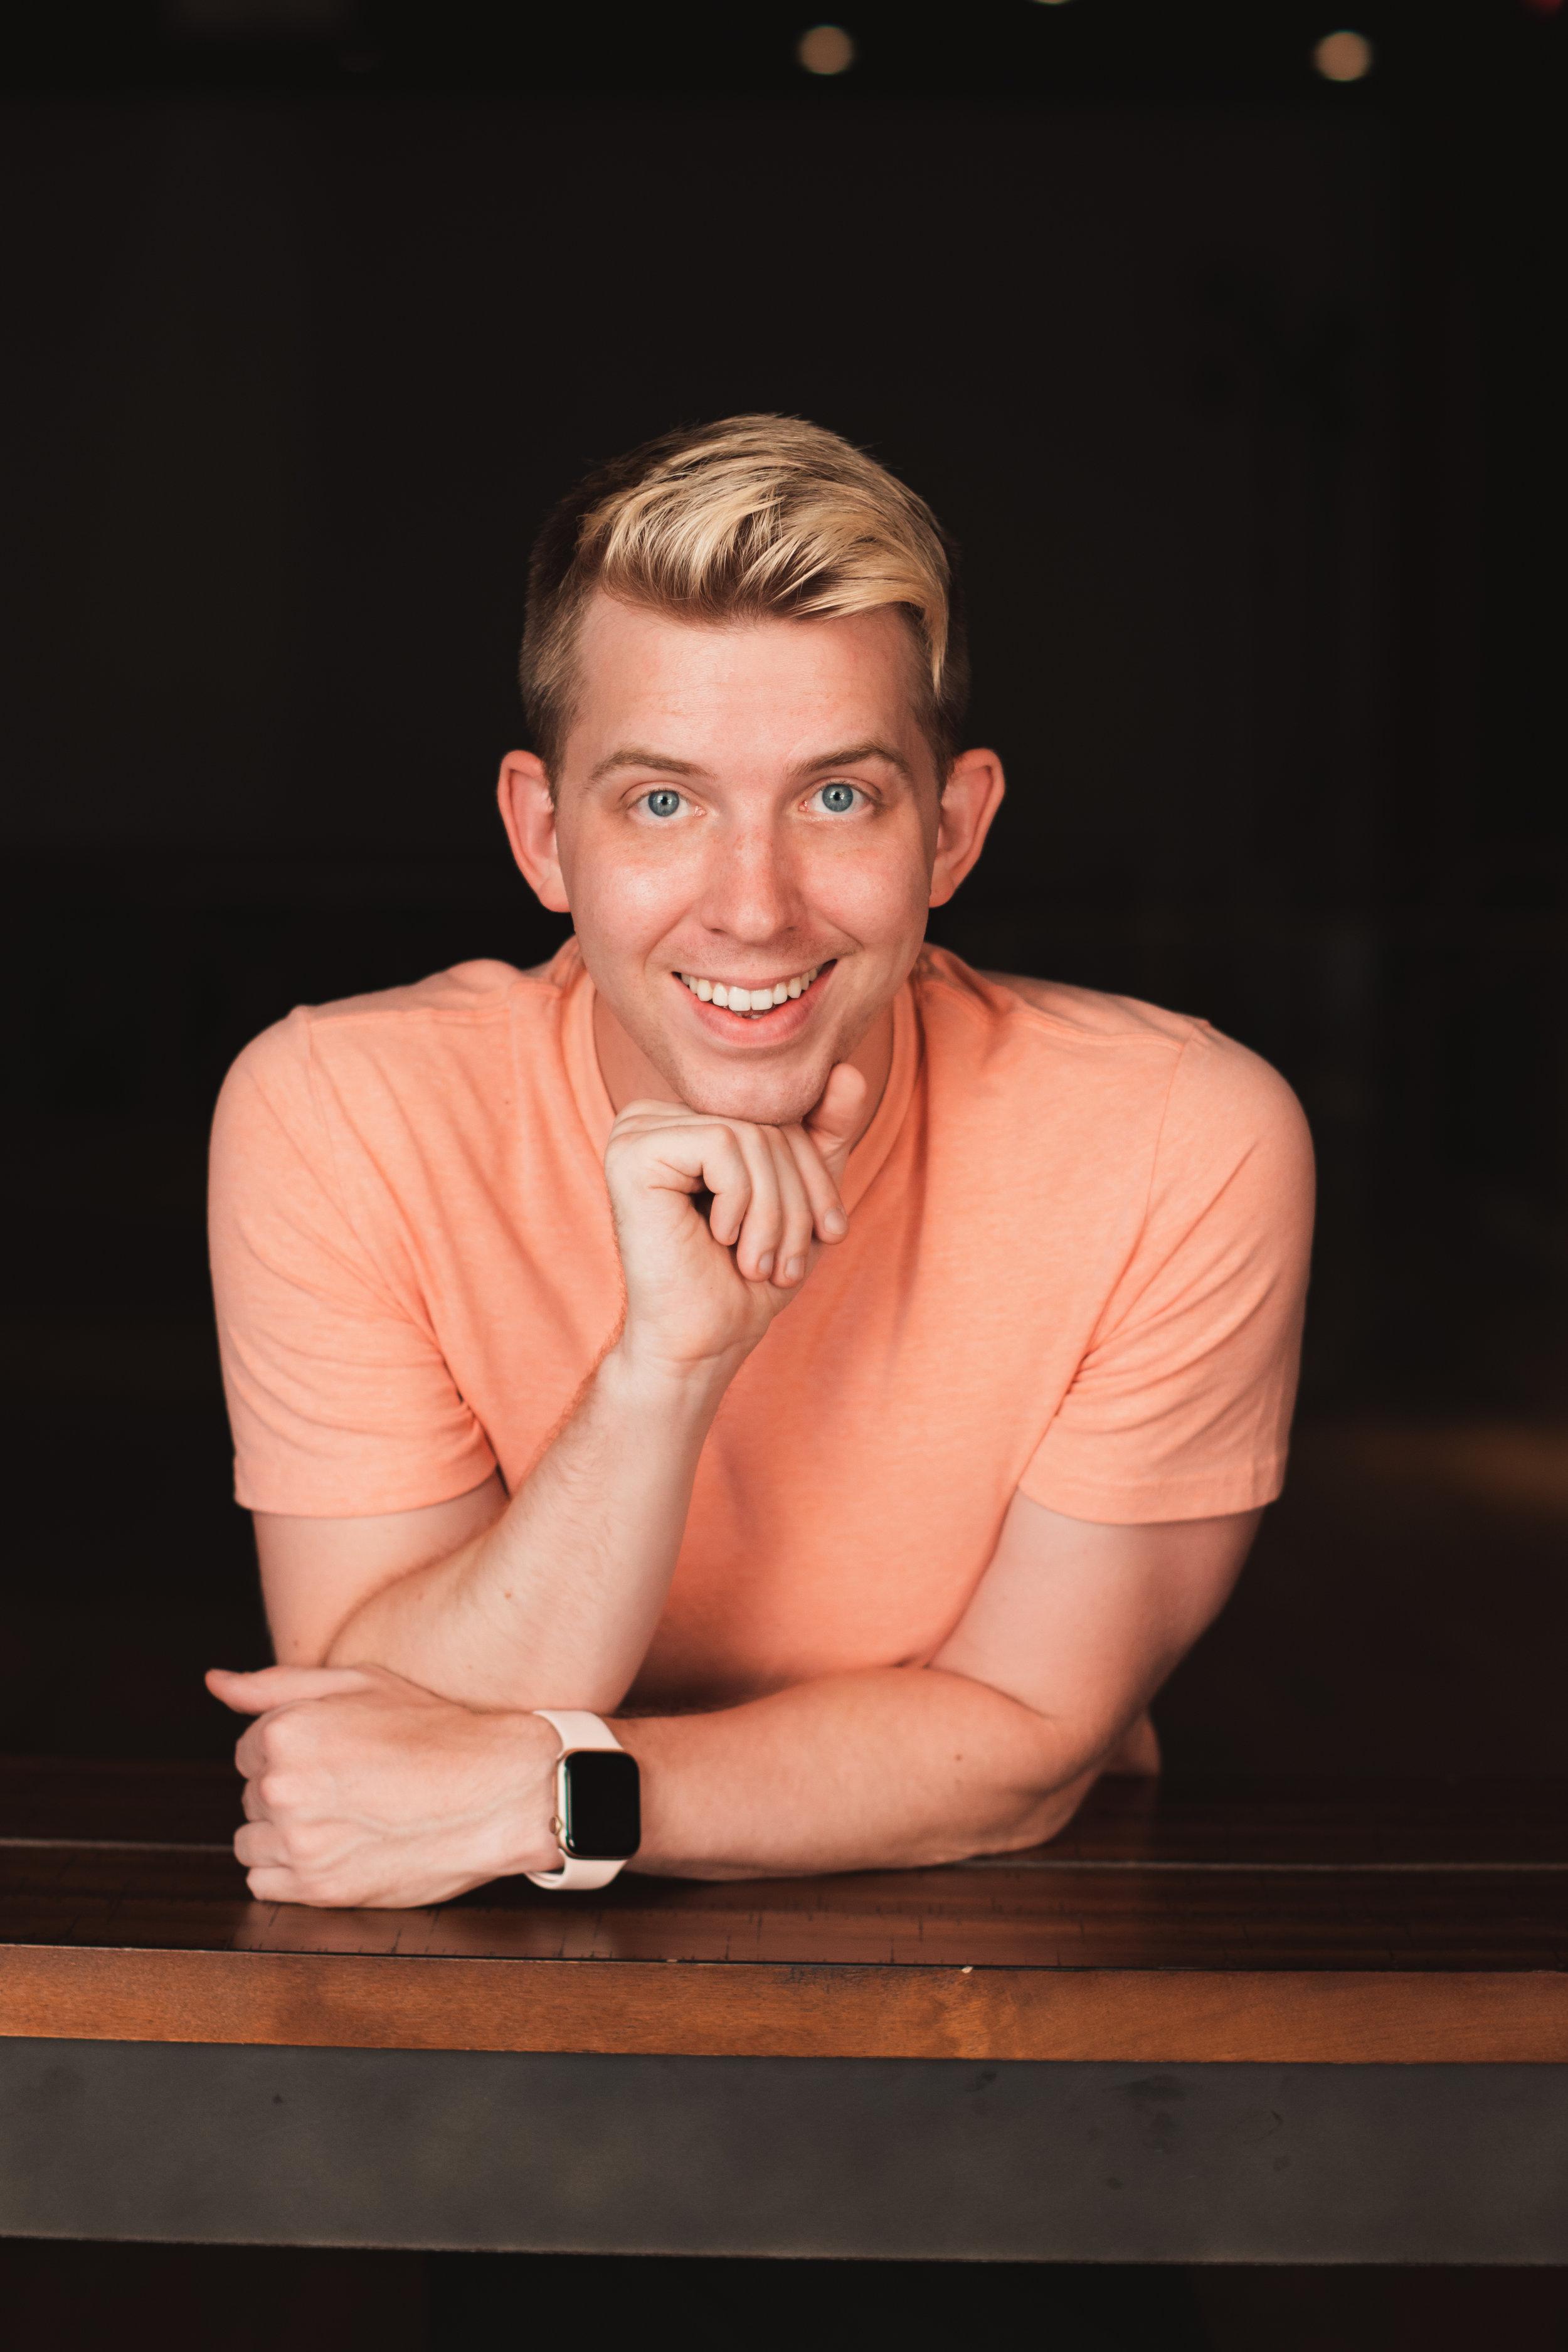 Caleb Face Marketing-7.jpg